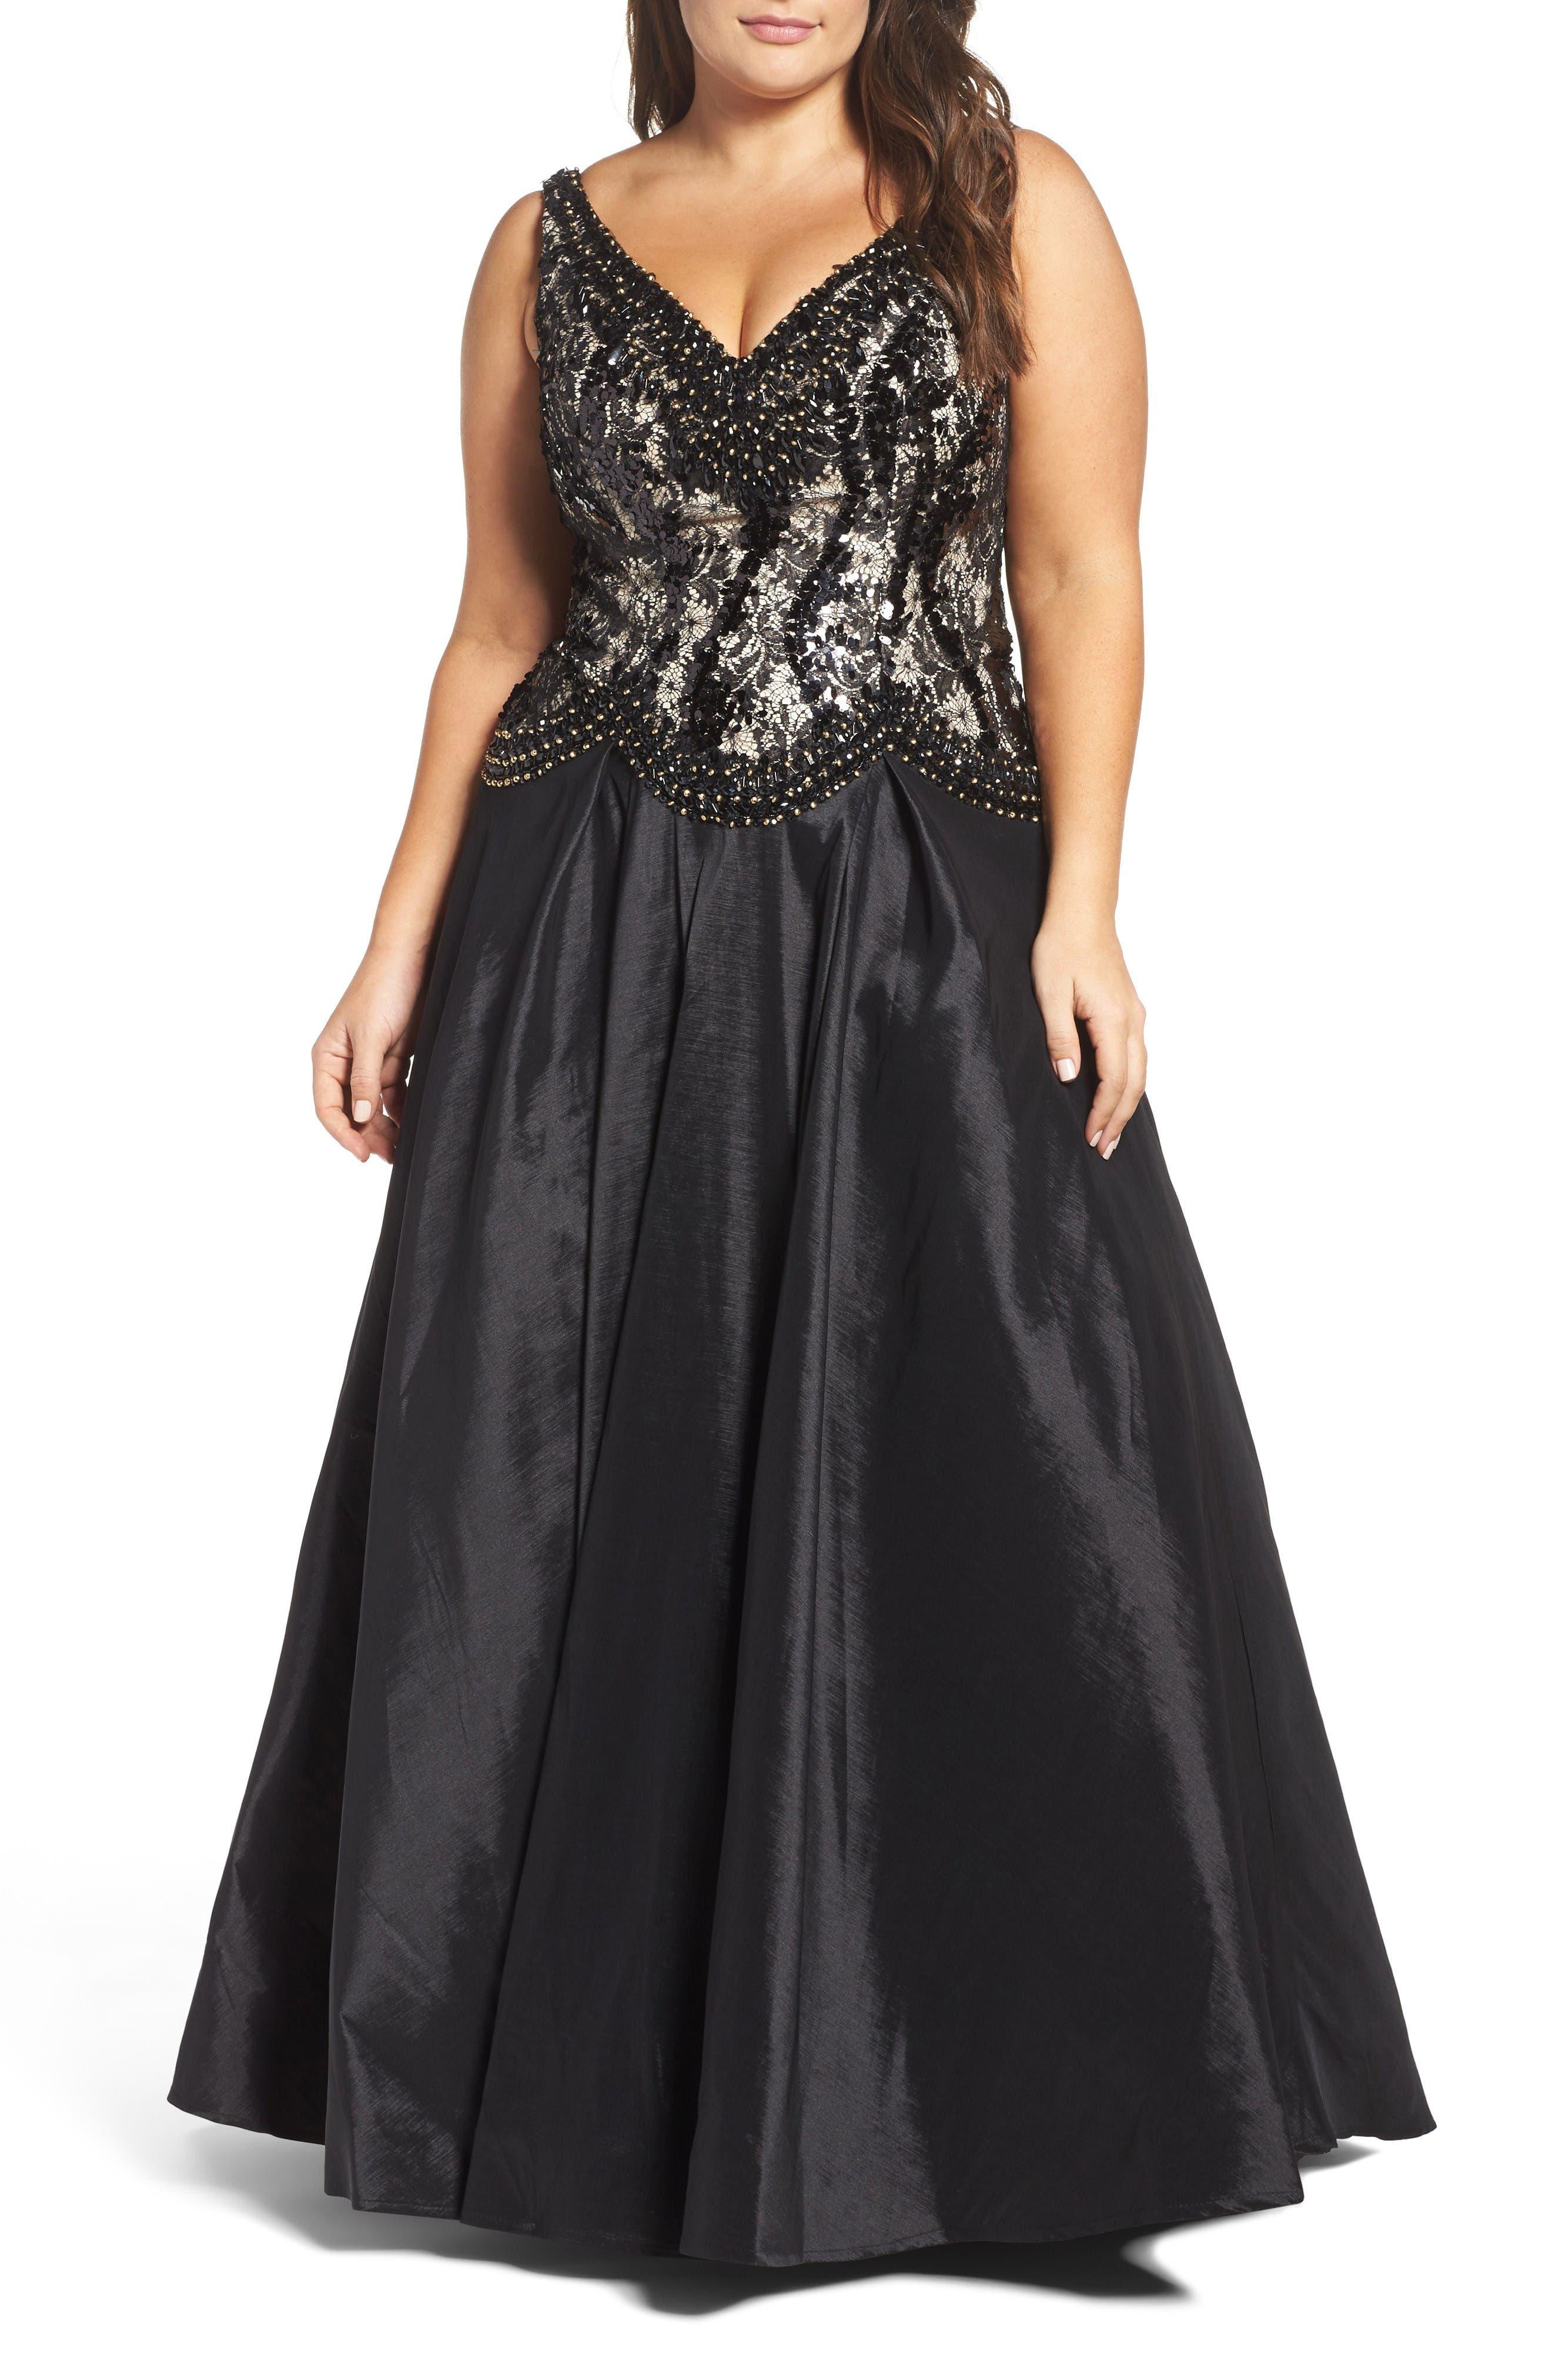 Main Image - Mac Duggal Lace & Taffeta Ballgown (Plus Size)